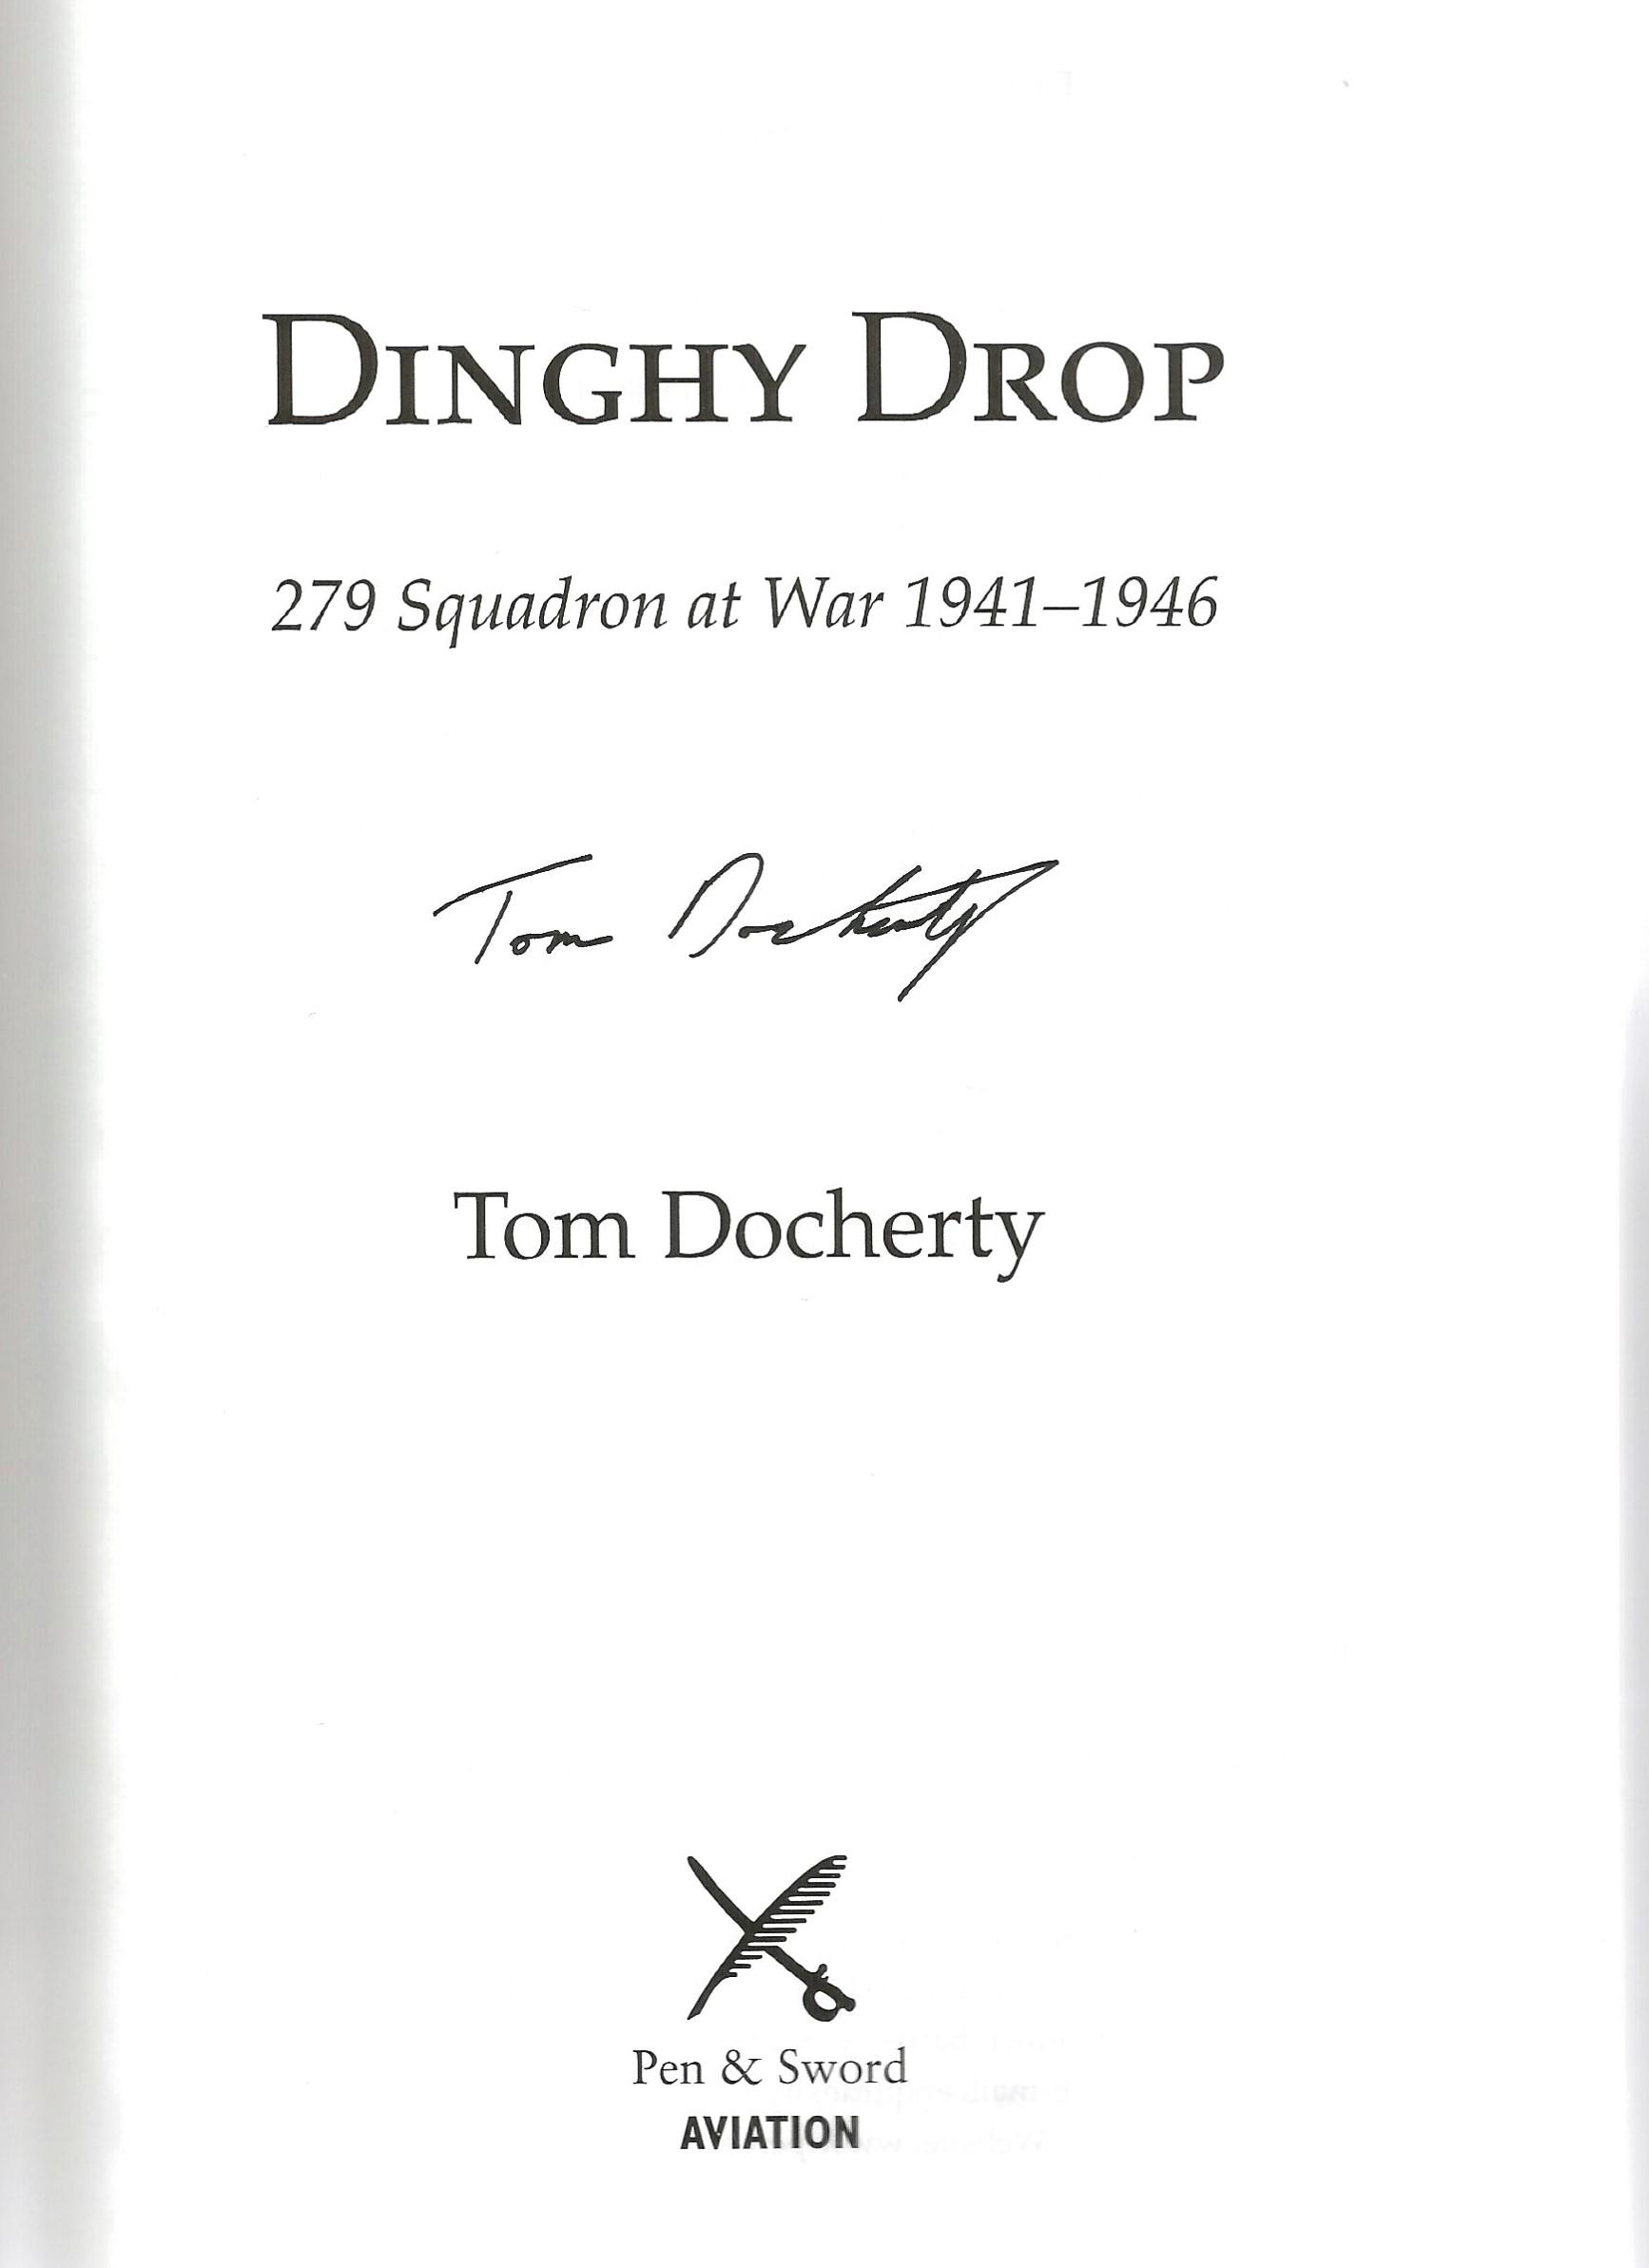 Tom Docherty. Dinghy Drop, 279 Squadron RAF 1941 46. a WW2 First edition hardback book in superb - Image 2 of 2